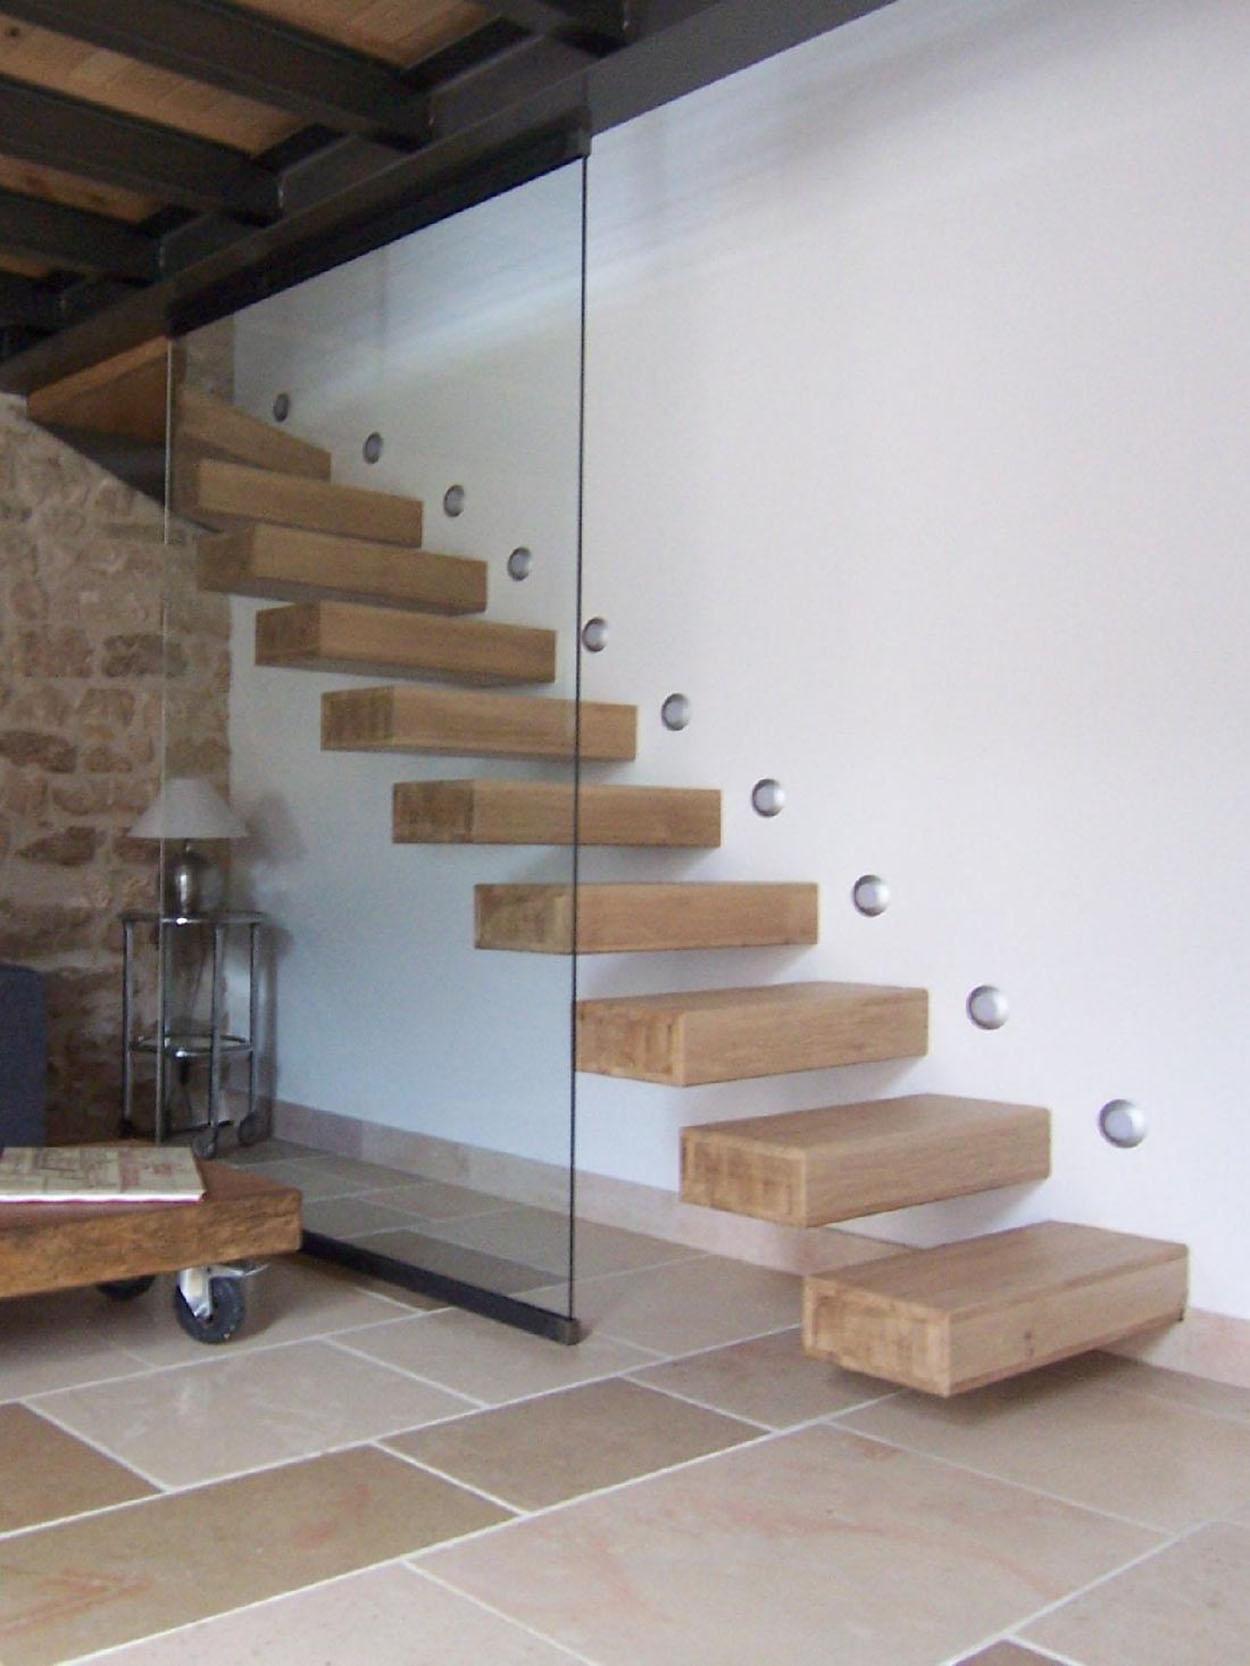 Renovation Escalier Nord Pas De Calais menuiseries intérieures en bois-escaliers en bois-portes de